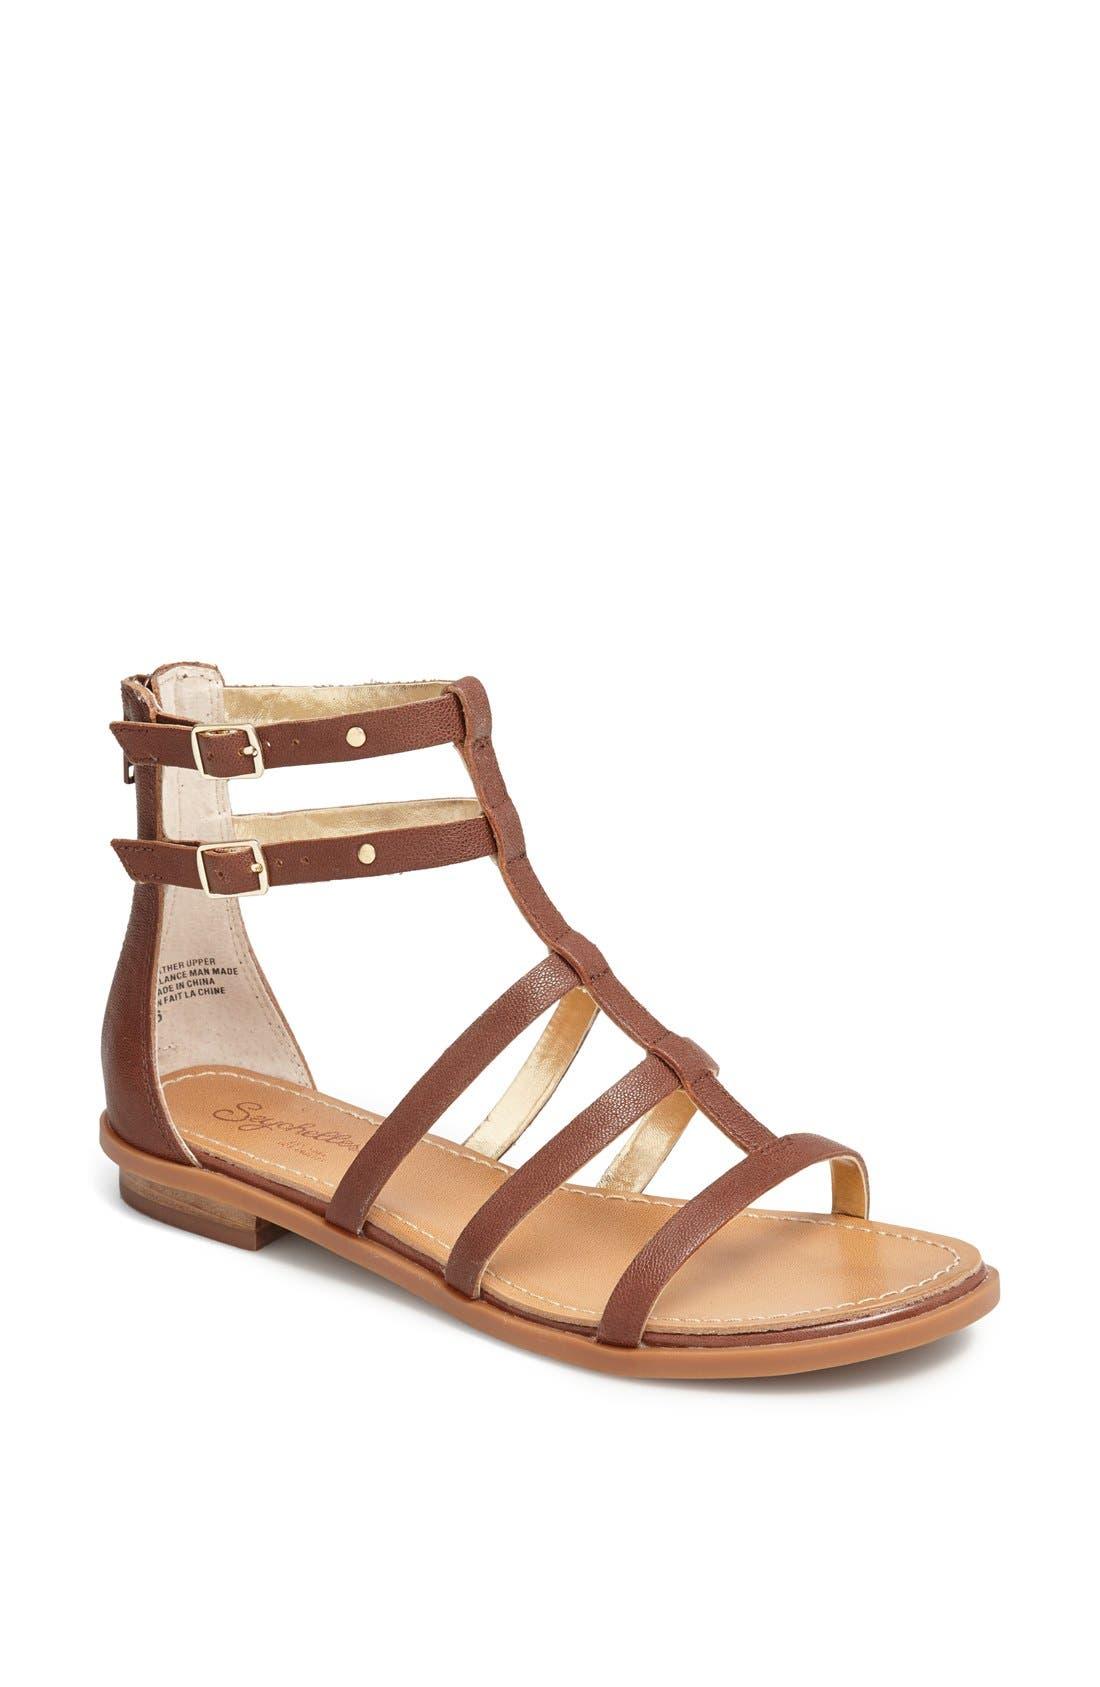 Main Image - Seychelles 'Aim High' Gladiator Sandal